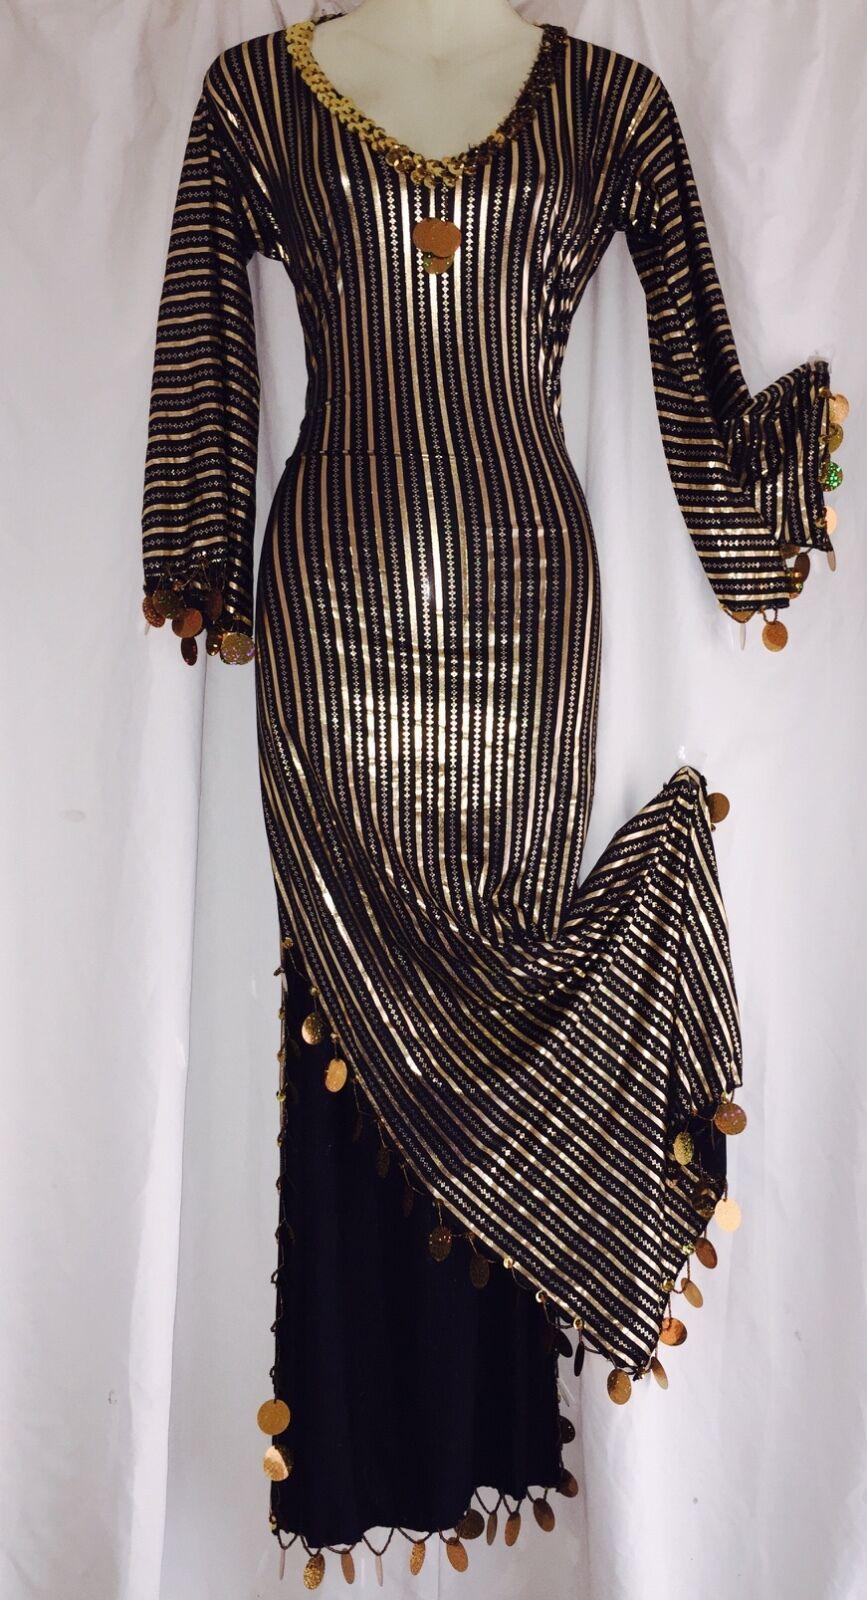 BELLY DANCE DRESS ABAYA Galabeya Baladi Costume Saidi Many Colors//Gold